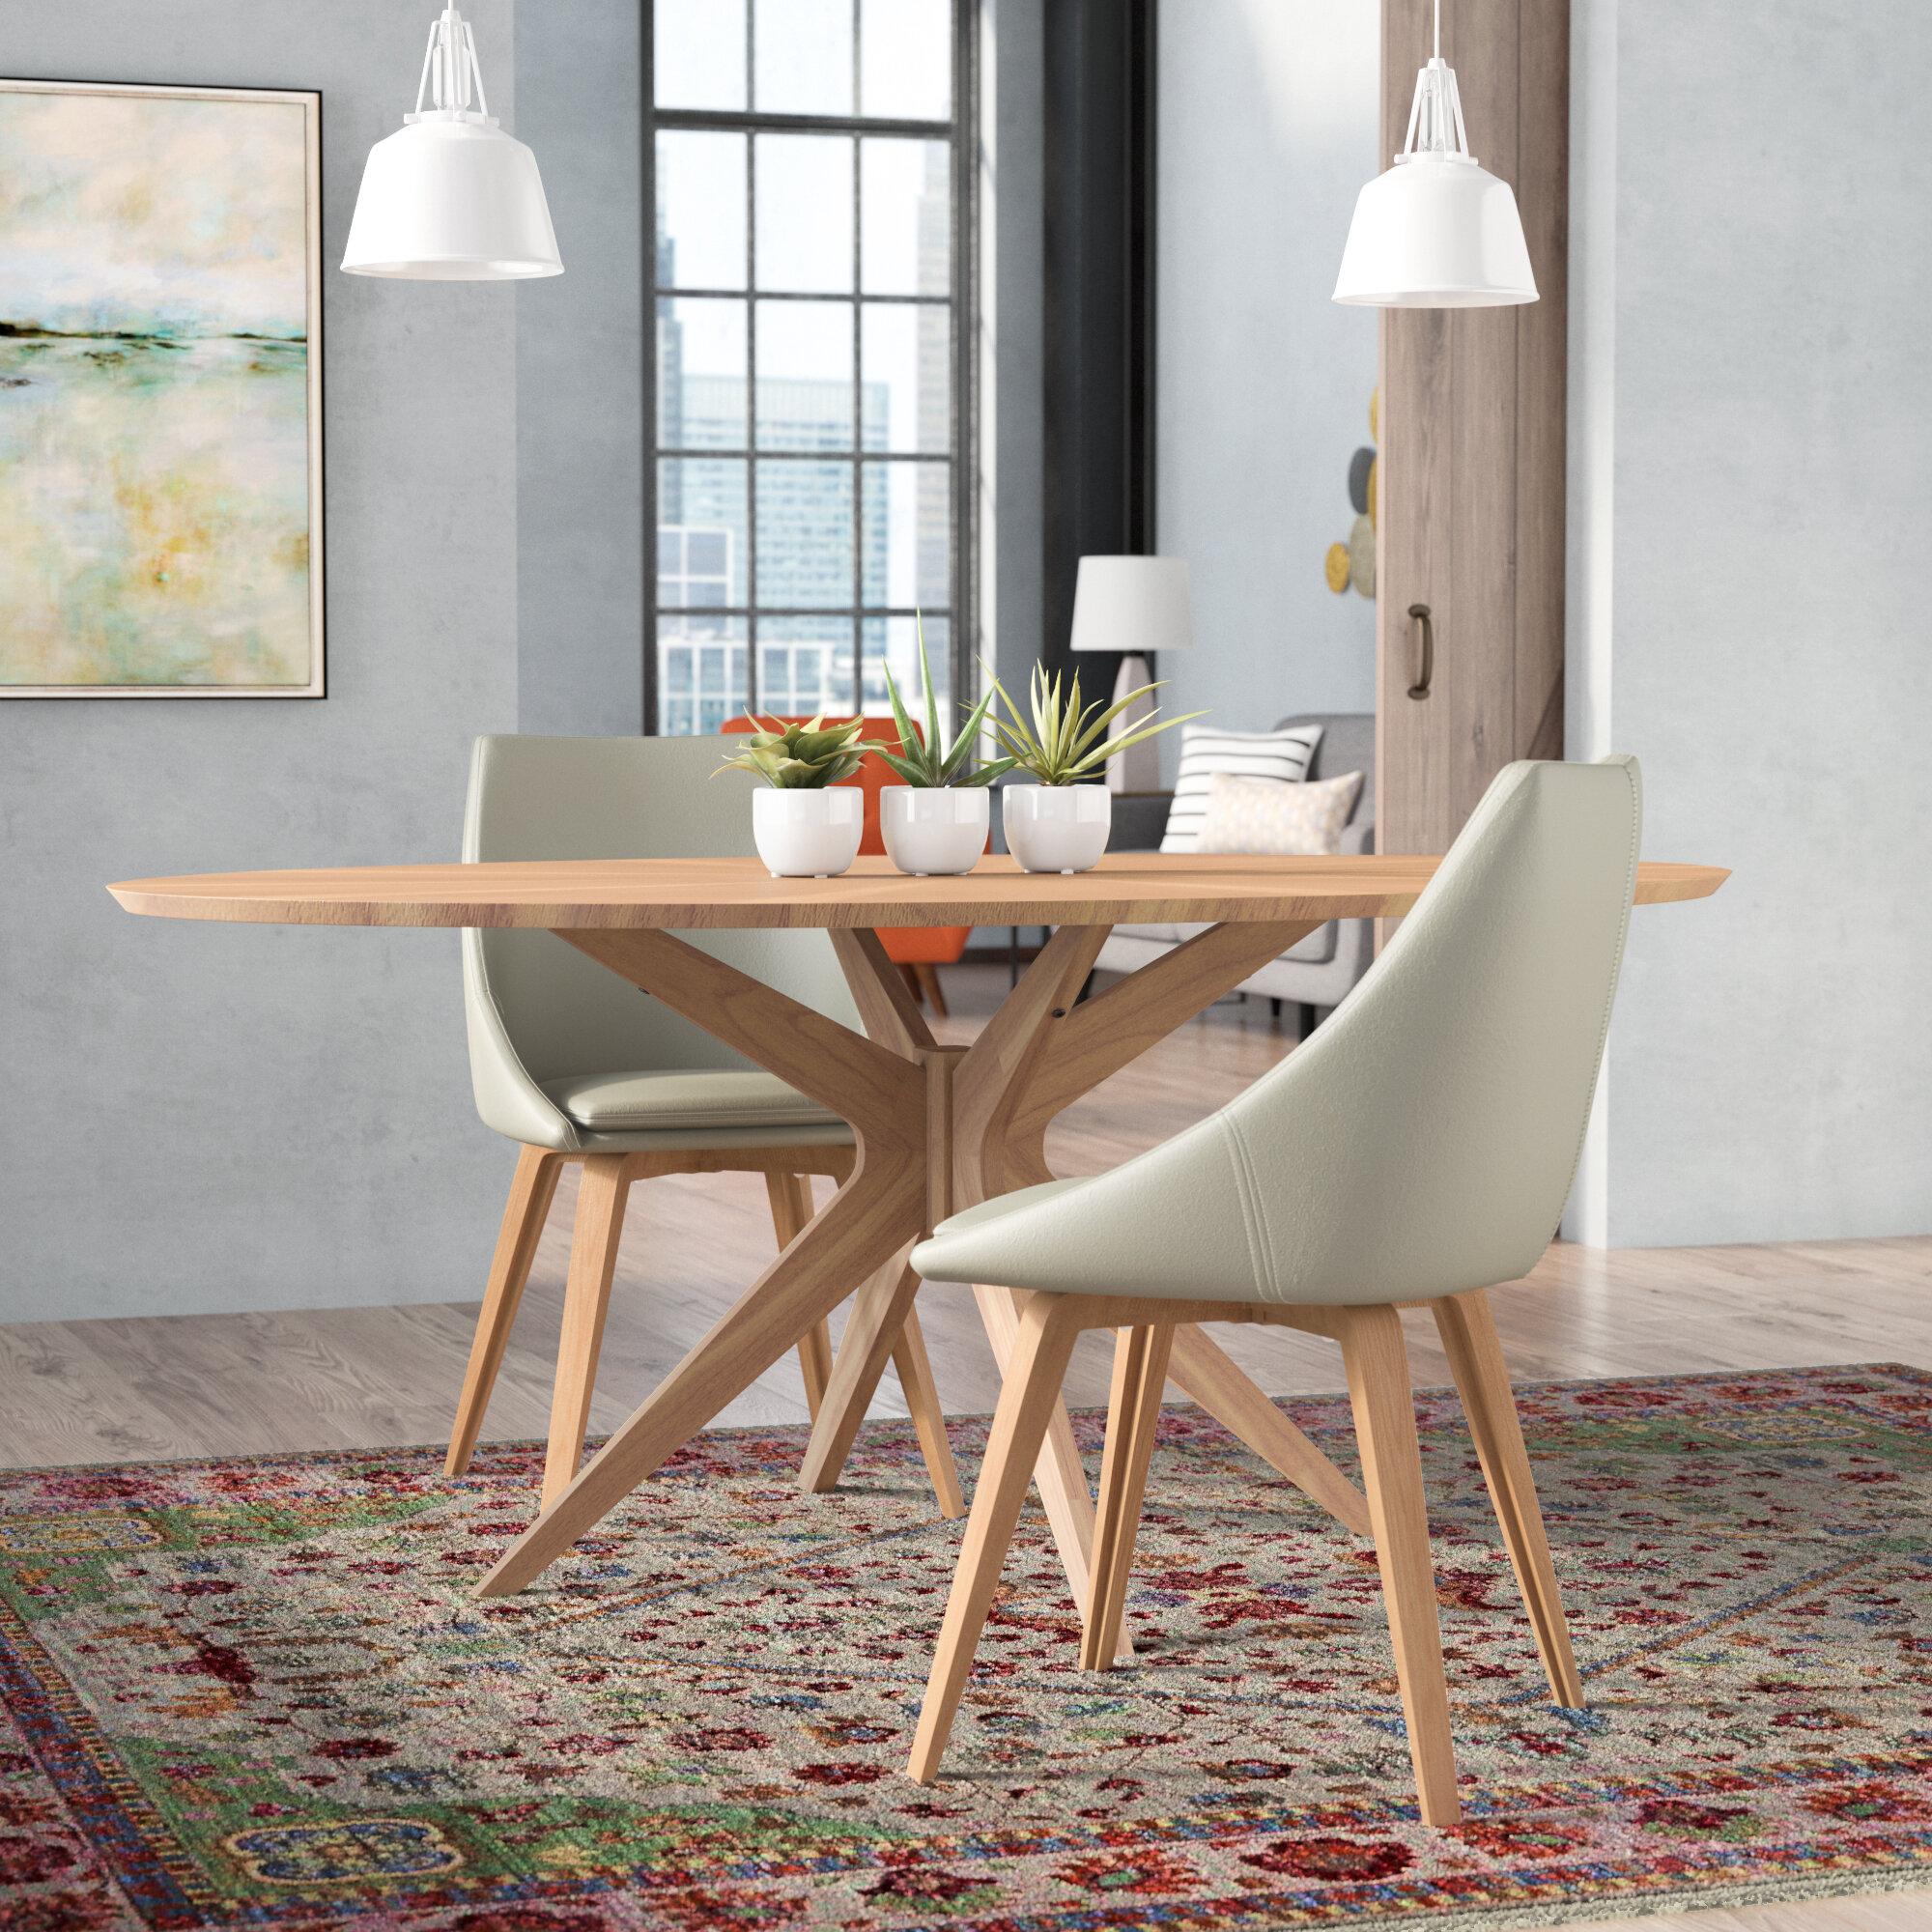 Miraculous Oak Laminate Top Dining Table Wayfair Download Free Architecture Designs Rallybritishbridgeorg